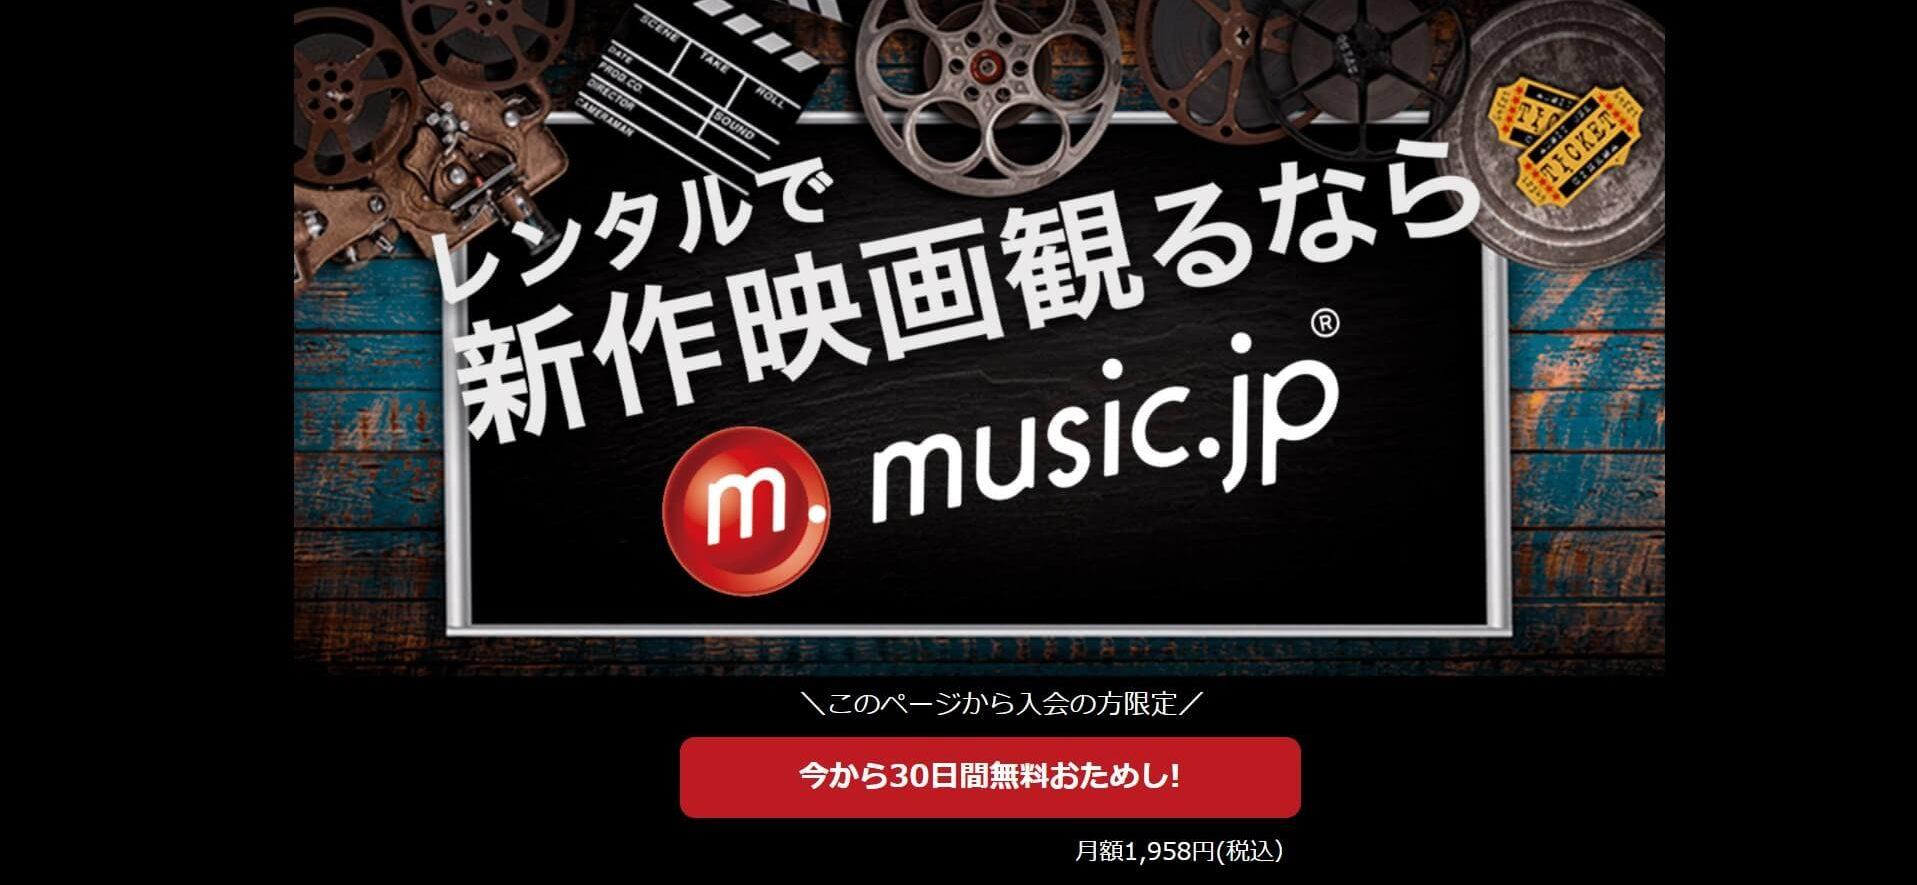 music.jpのTOPページ